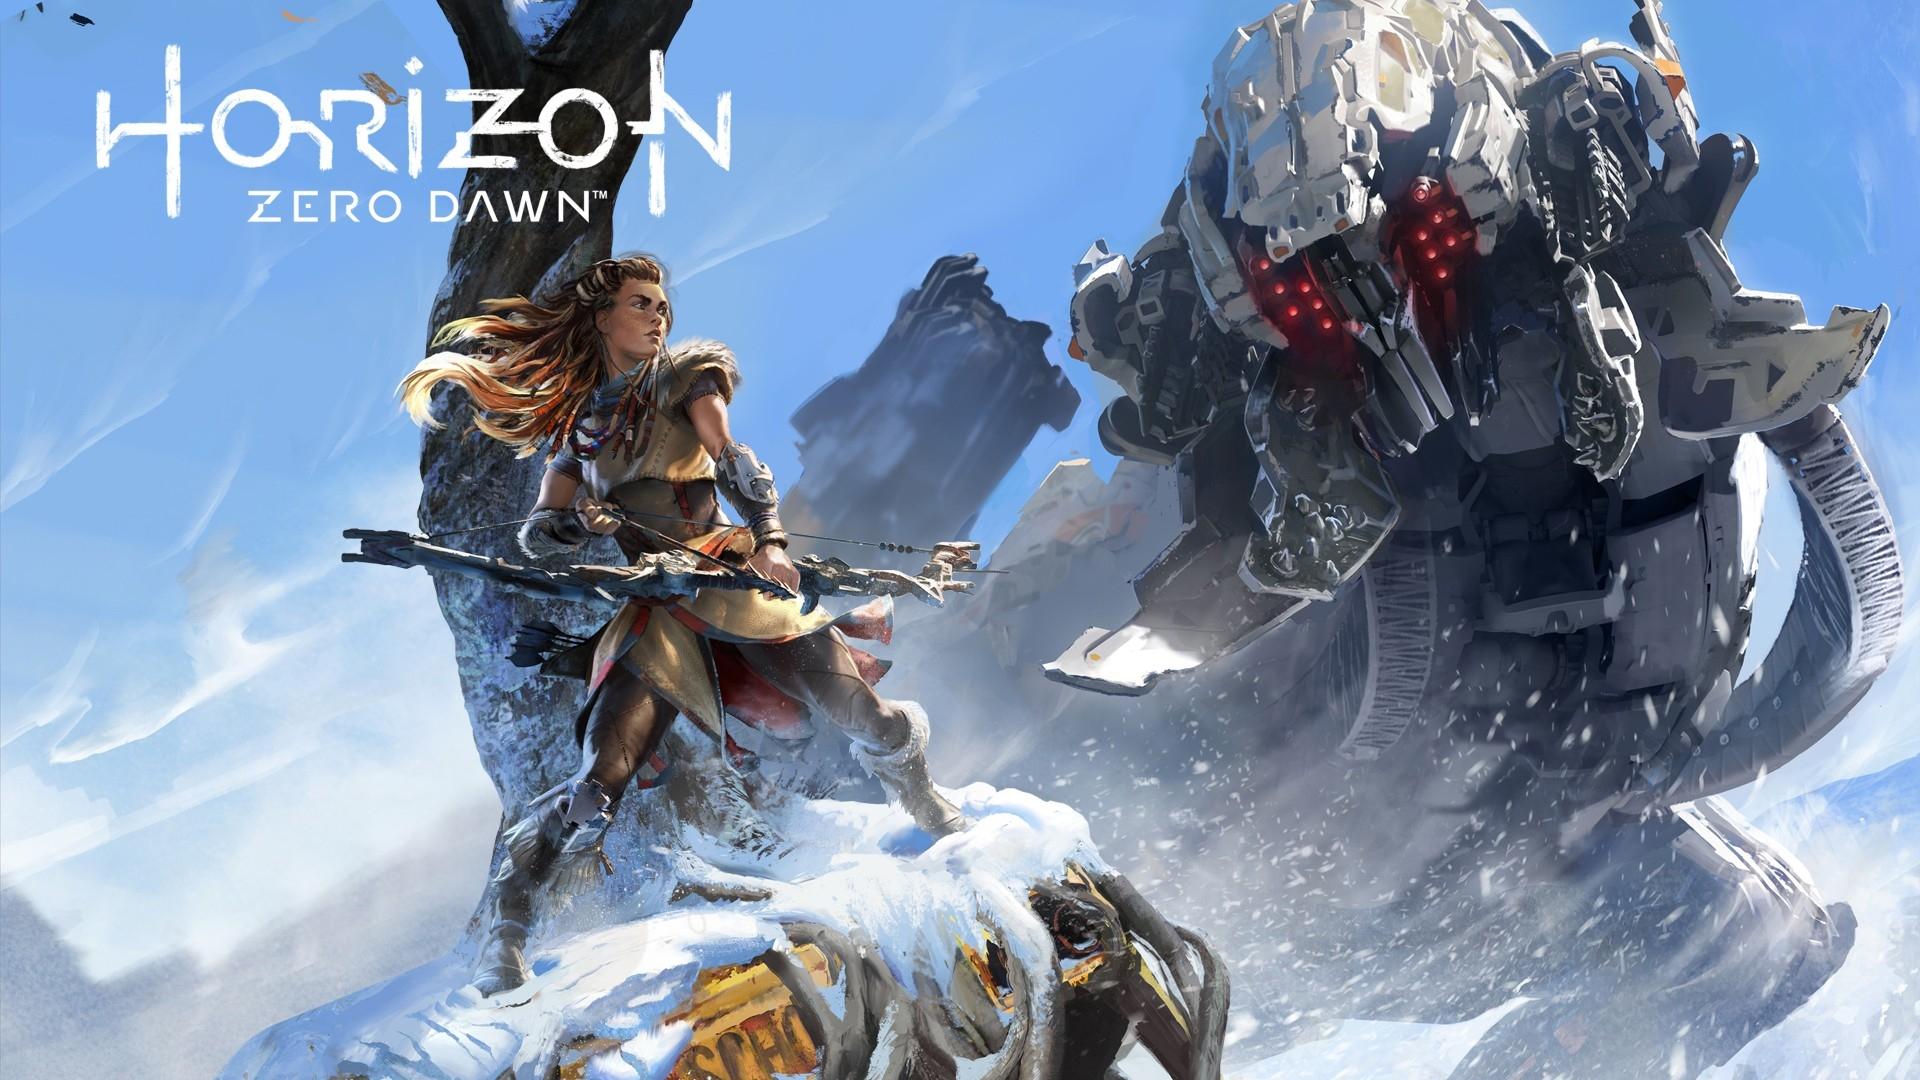 Horizon Zero Dawn Mutters Wacht Verschlossen